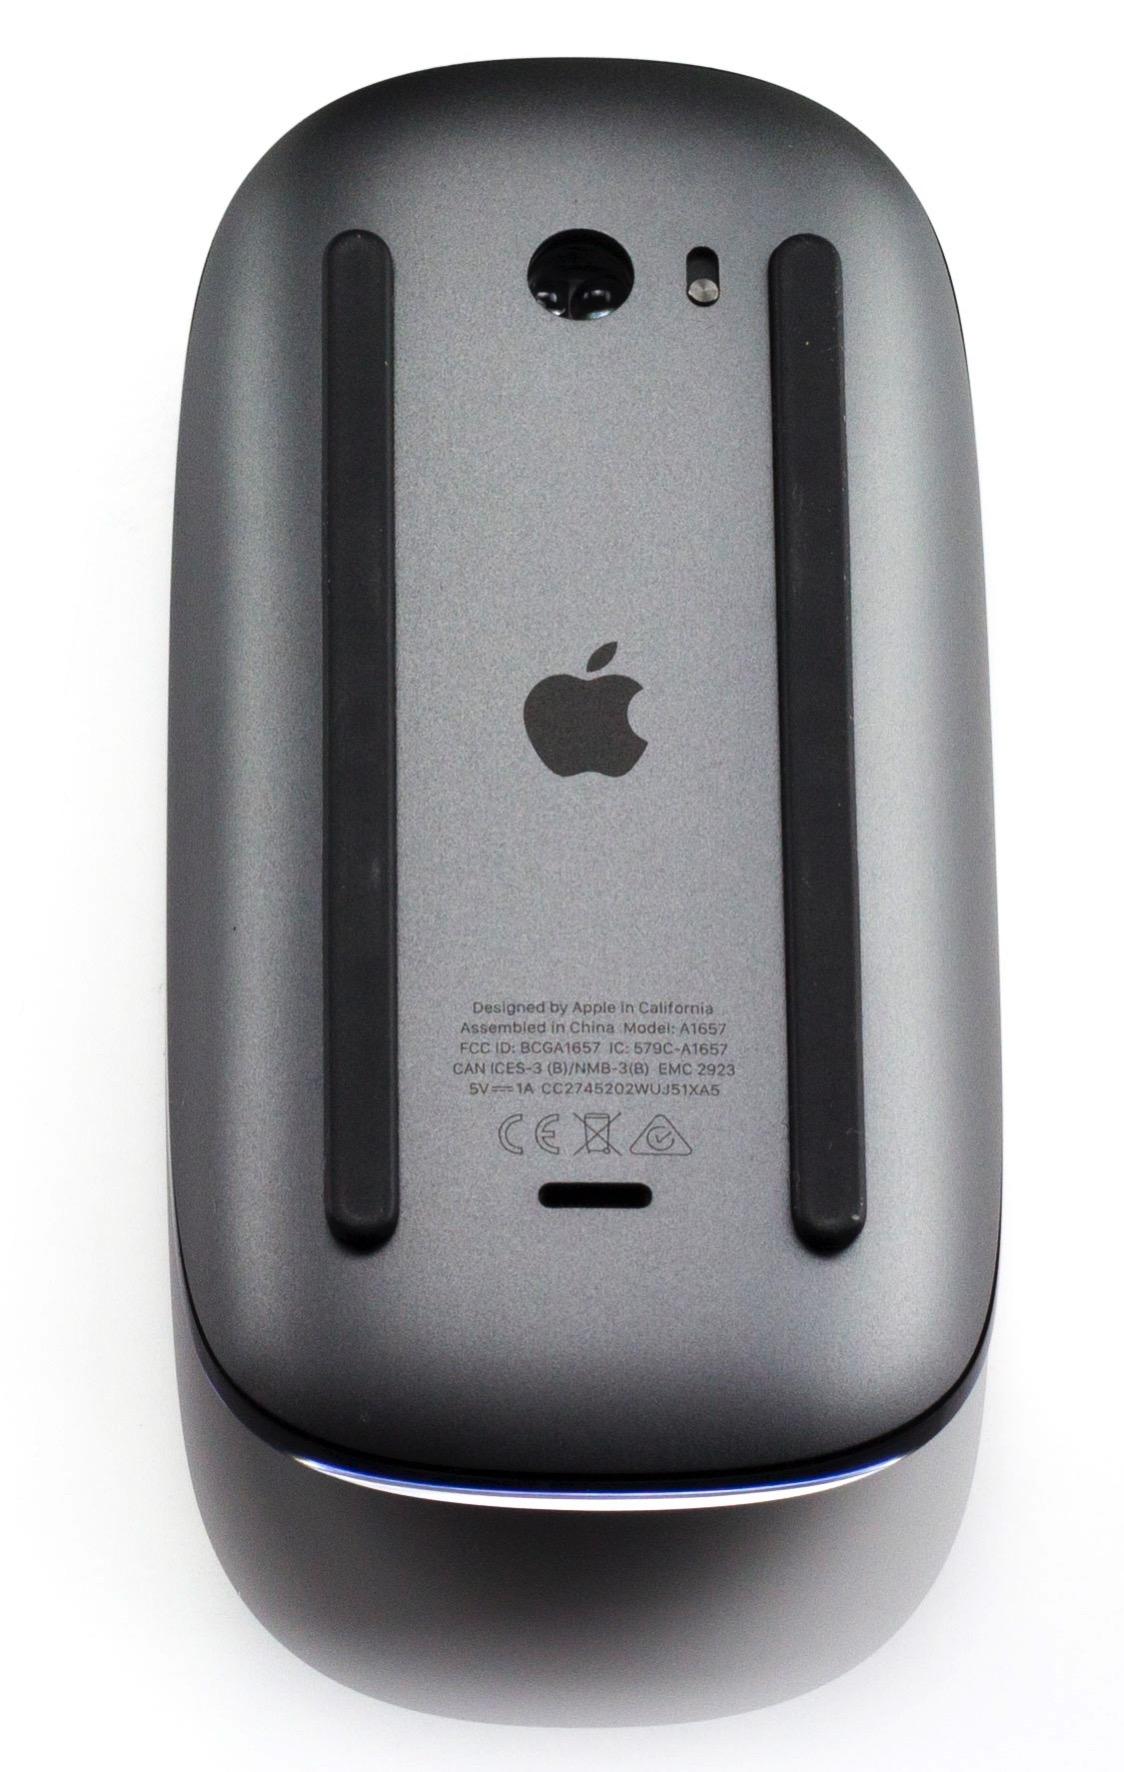 IMac Pro unboxing mouse